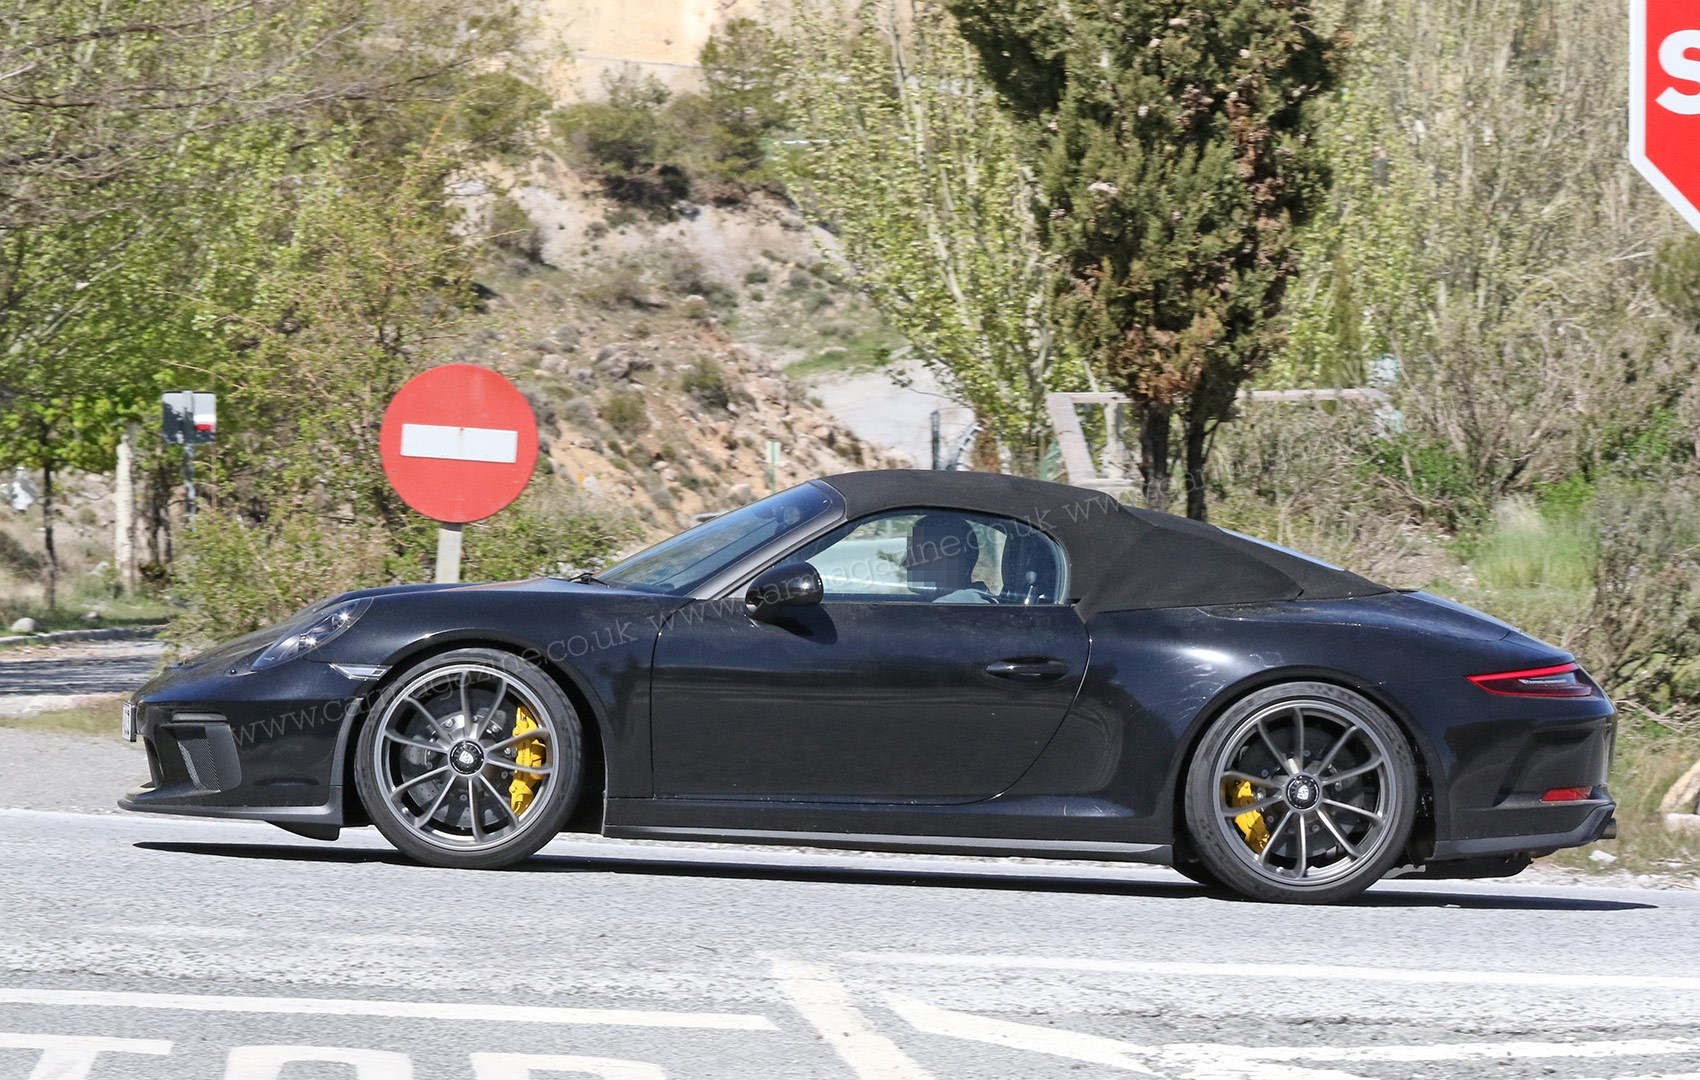 Porsche 911 Speedster spy photos specs prices | CAR Magazine